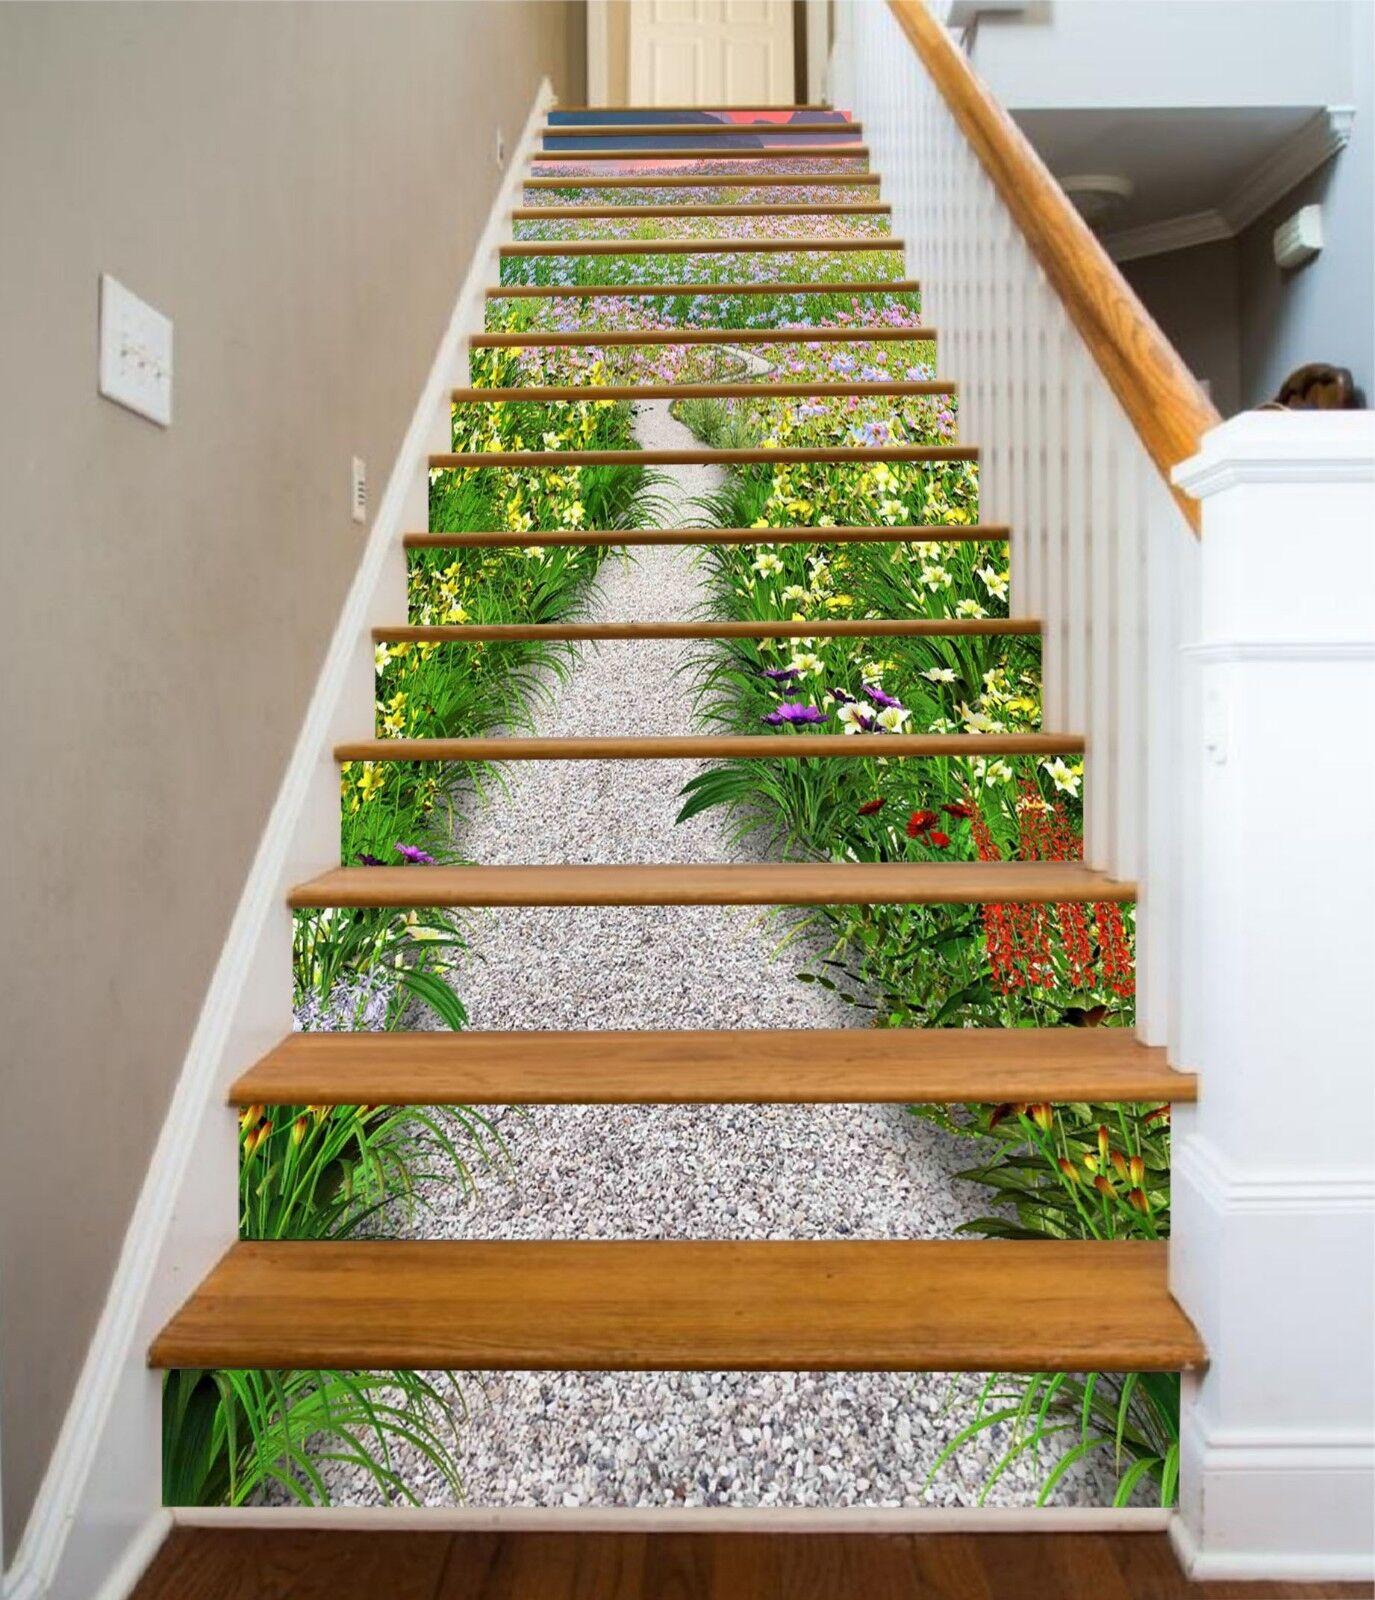 3D Flowers Road 3 Stair Risers Decoration Photo Mural Vinyl Decal Wallpaper CA